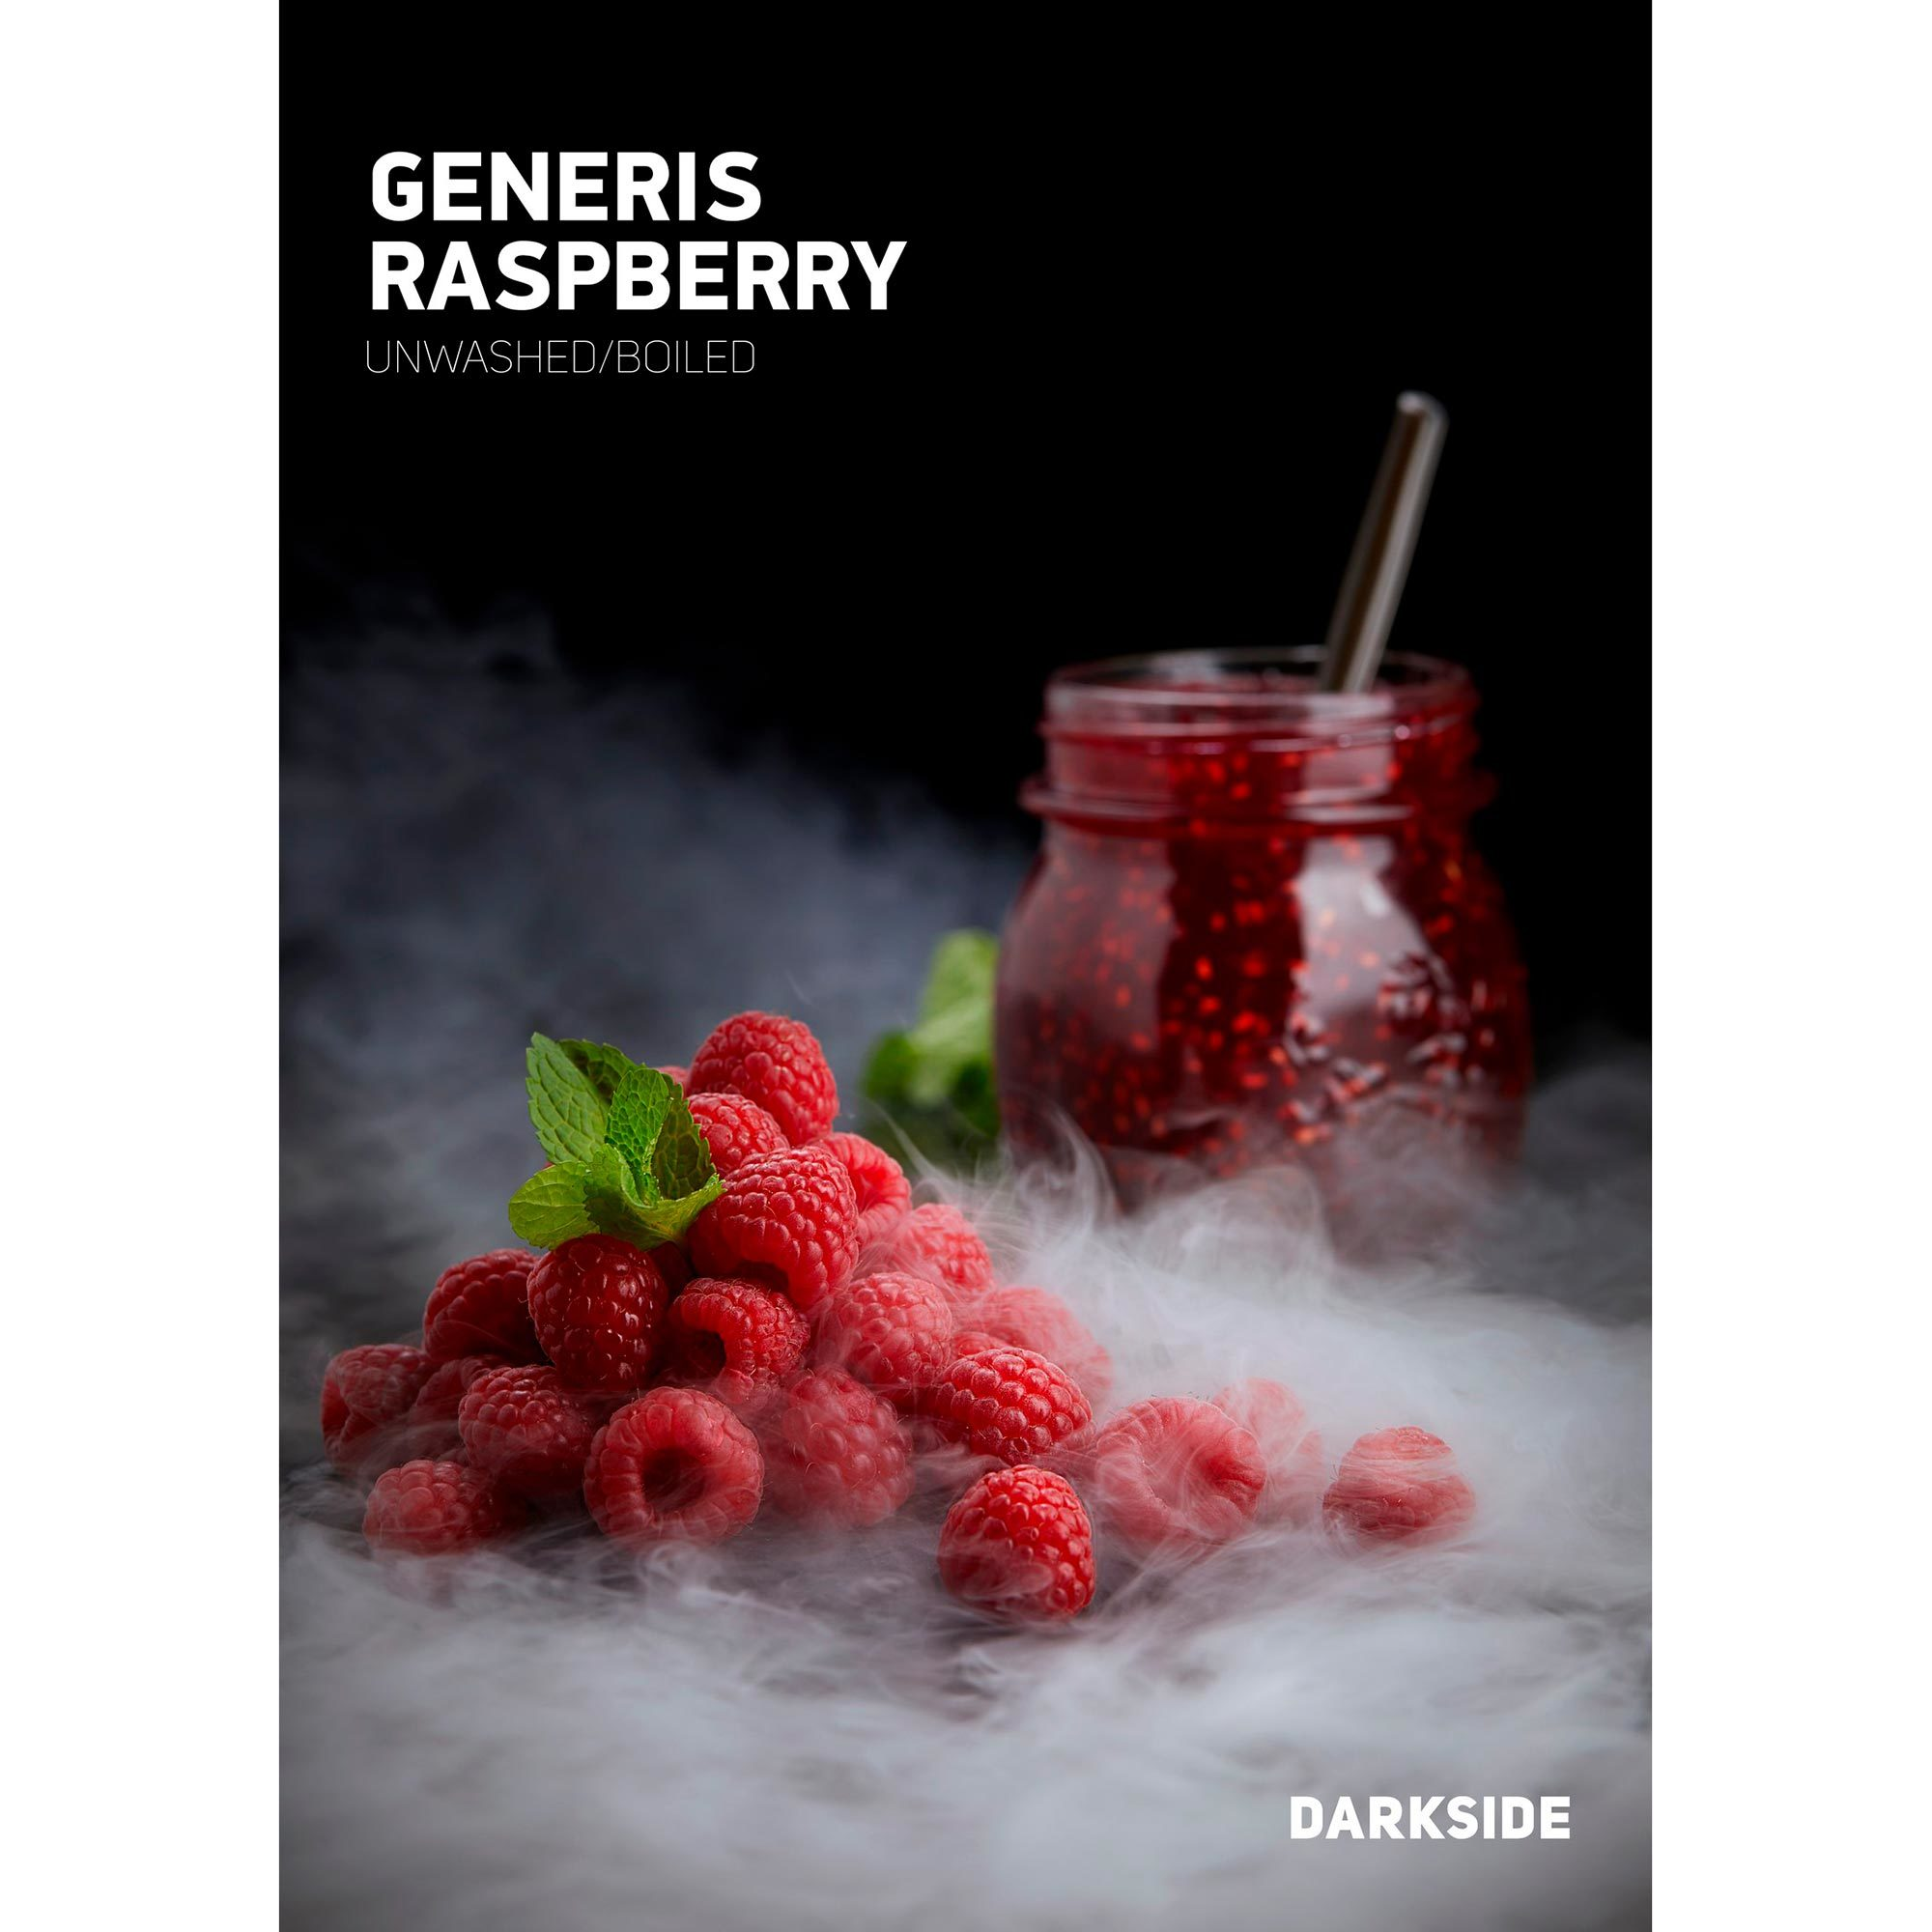 Табак для кальяна Dark Side Core 100 гр Generis Raspberry, магазин FOHM